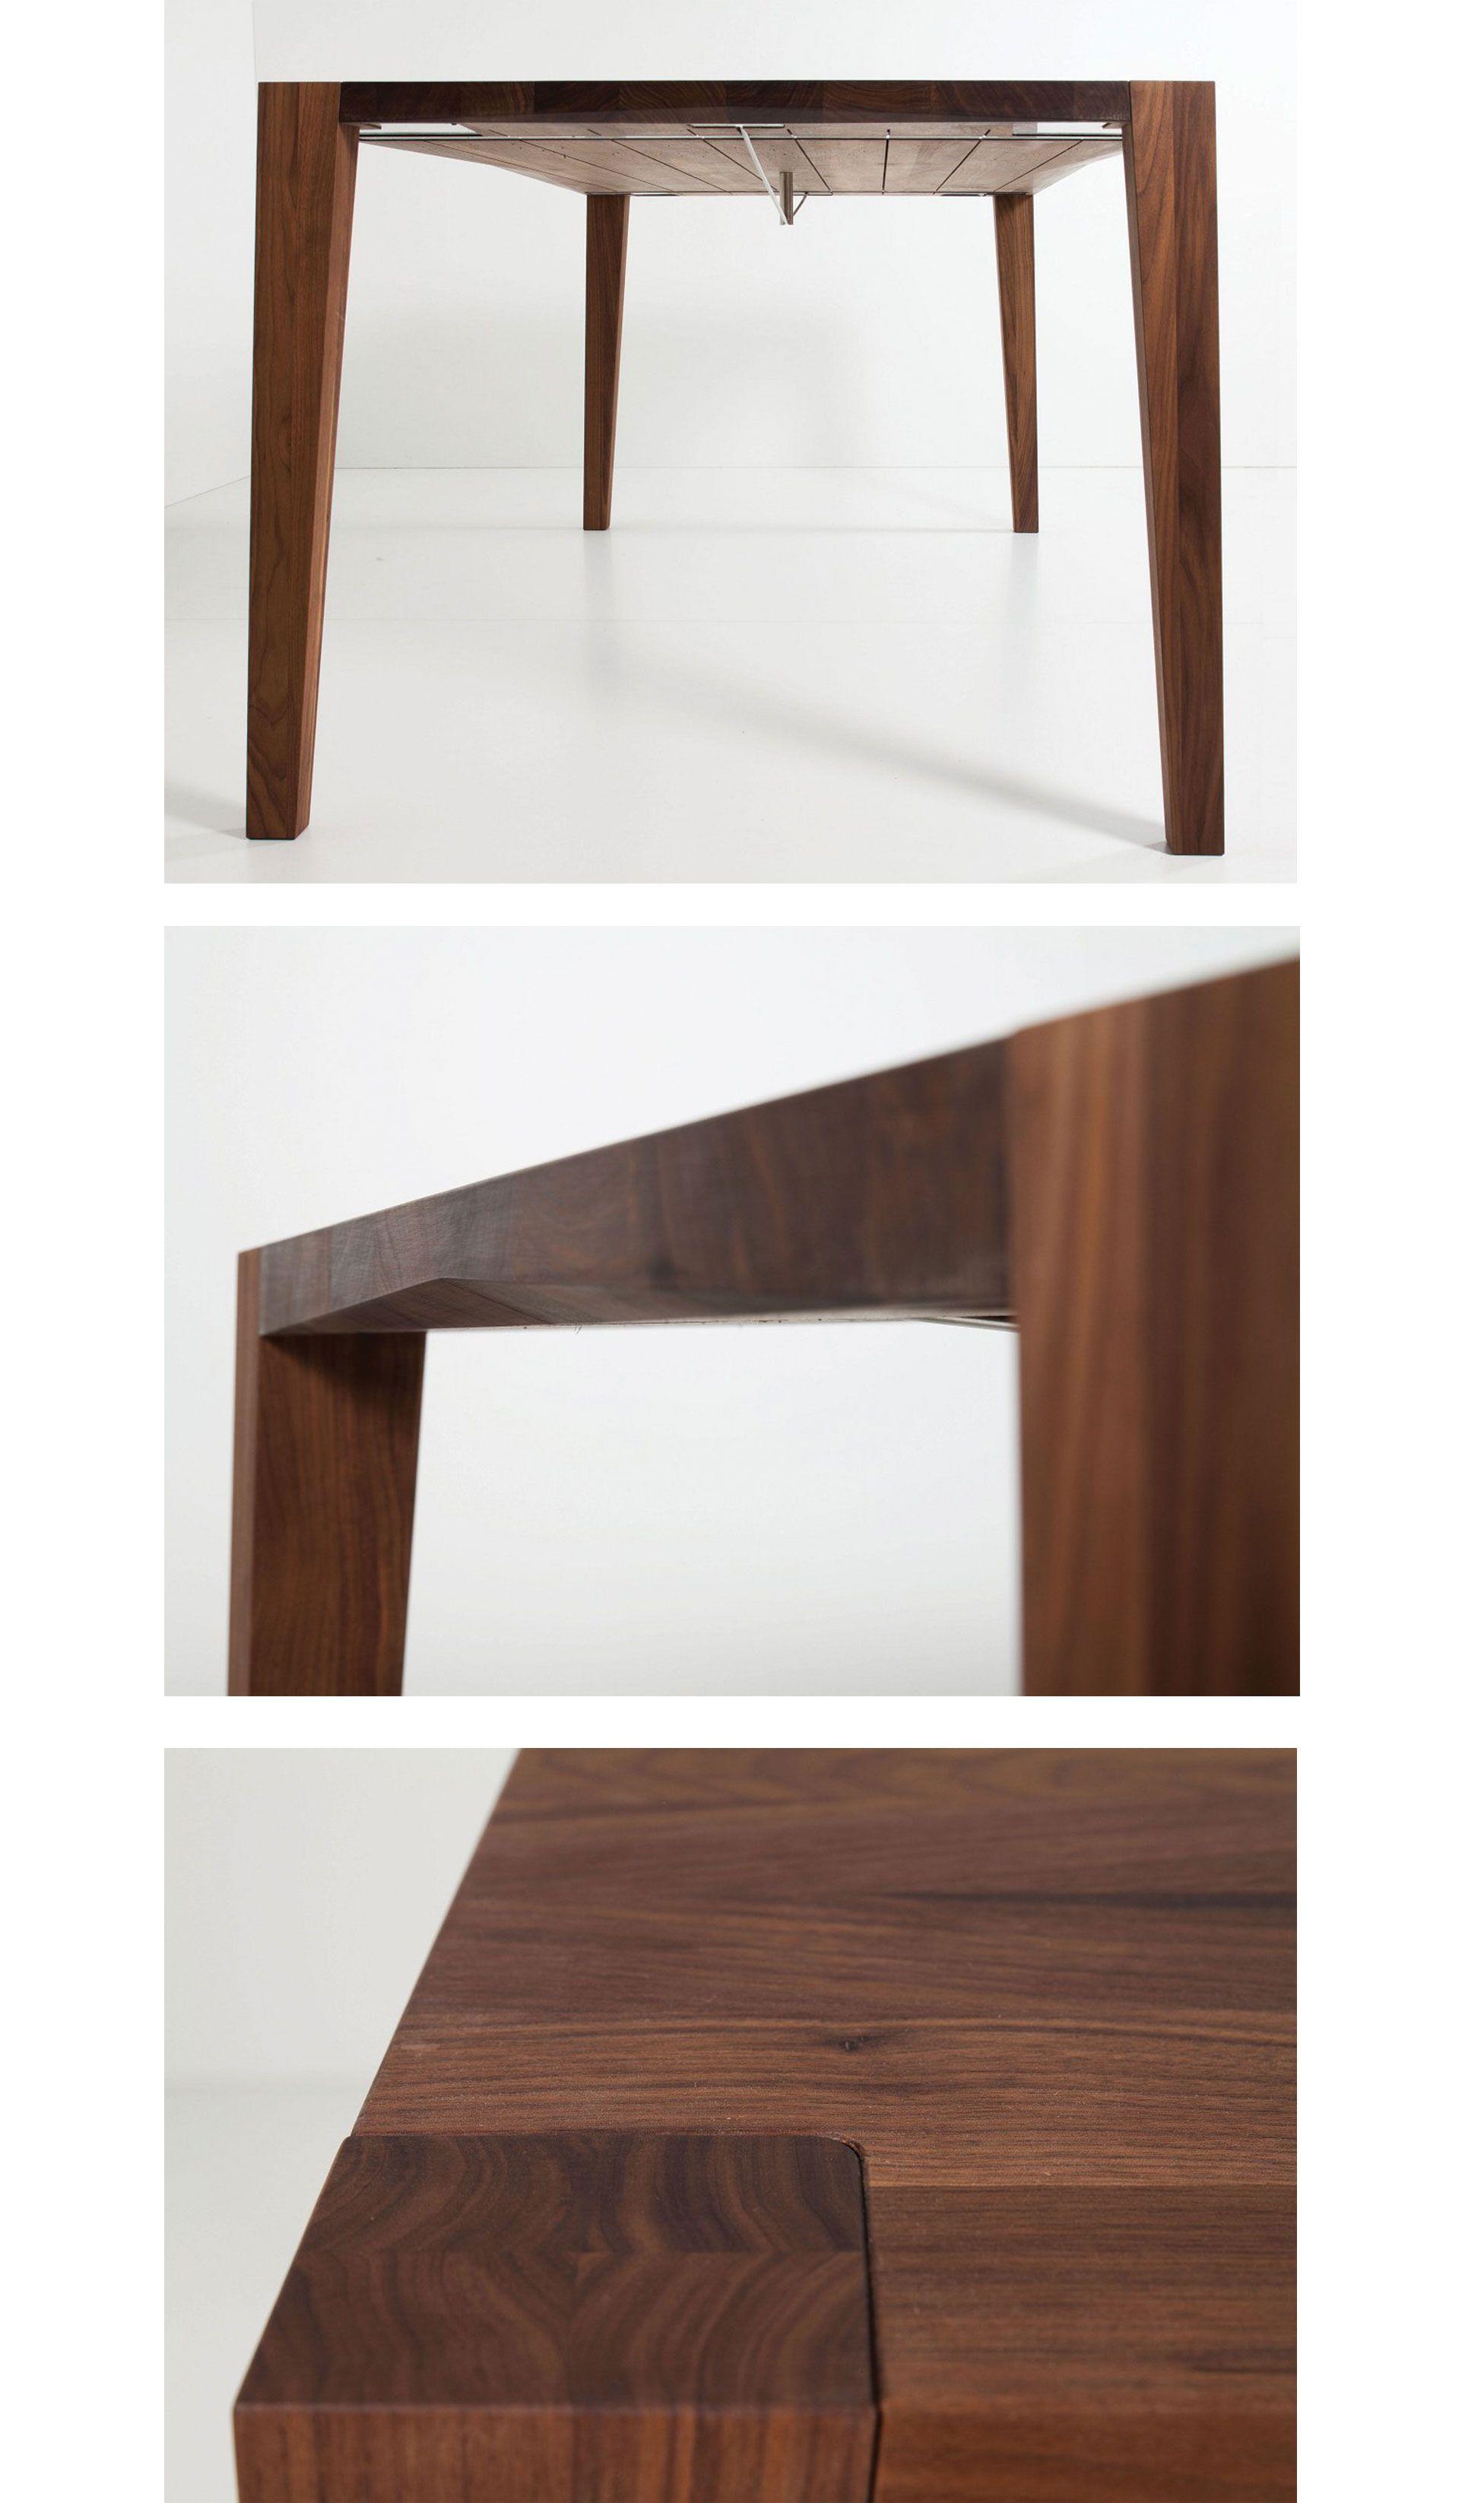 b8b0324060c7 Furniture Designs JAVORINA    Masívny dubový stôl